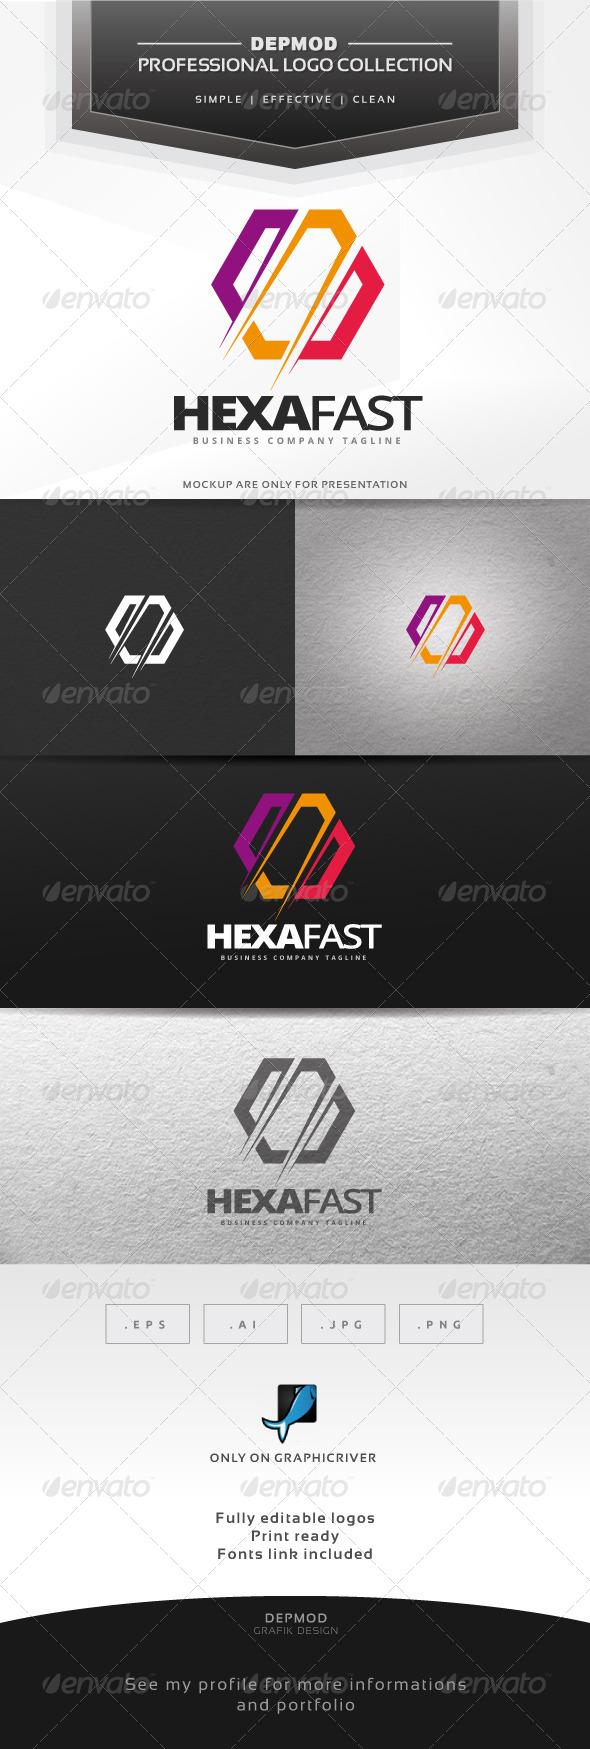 Hexa Fast Logo - Abstract Logo Templates